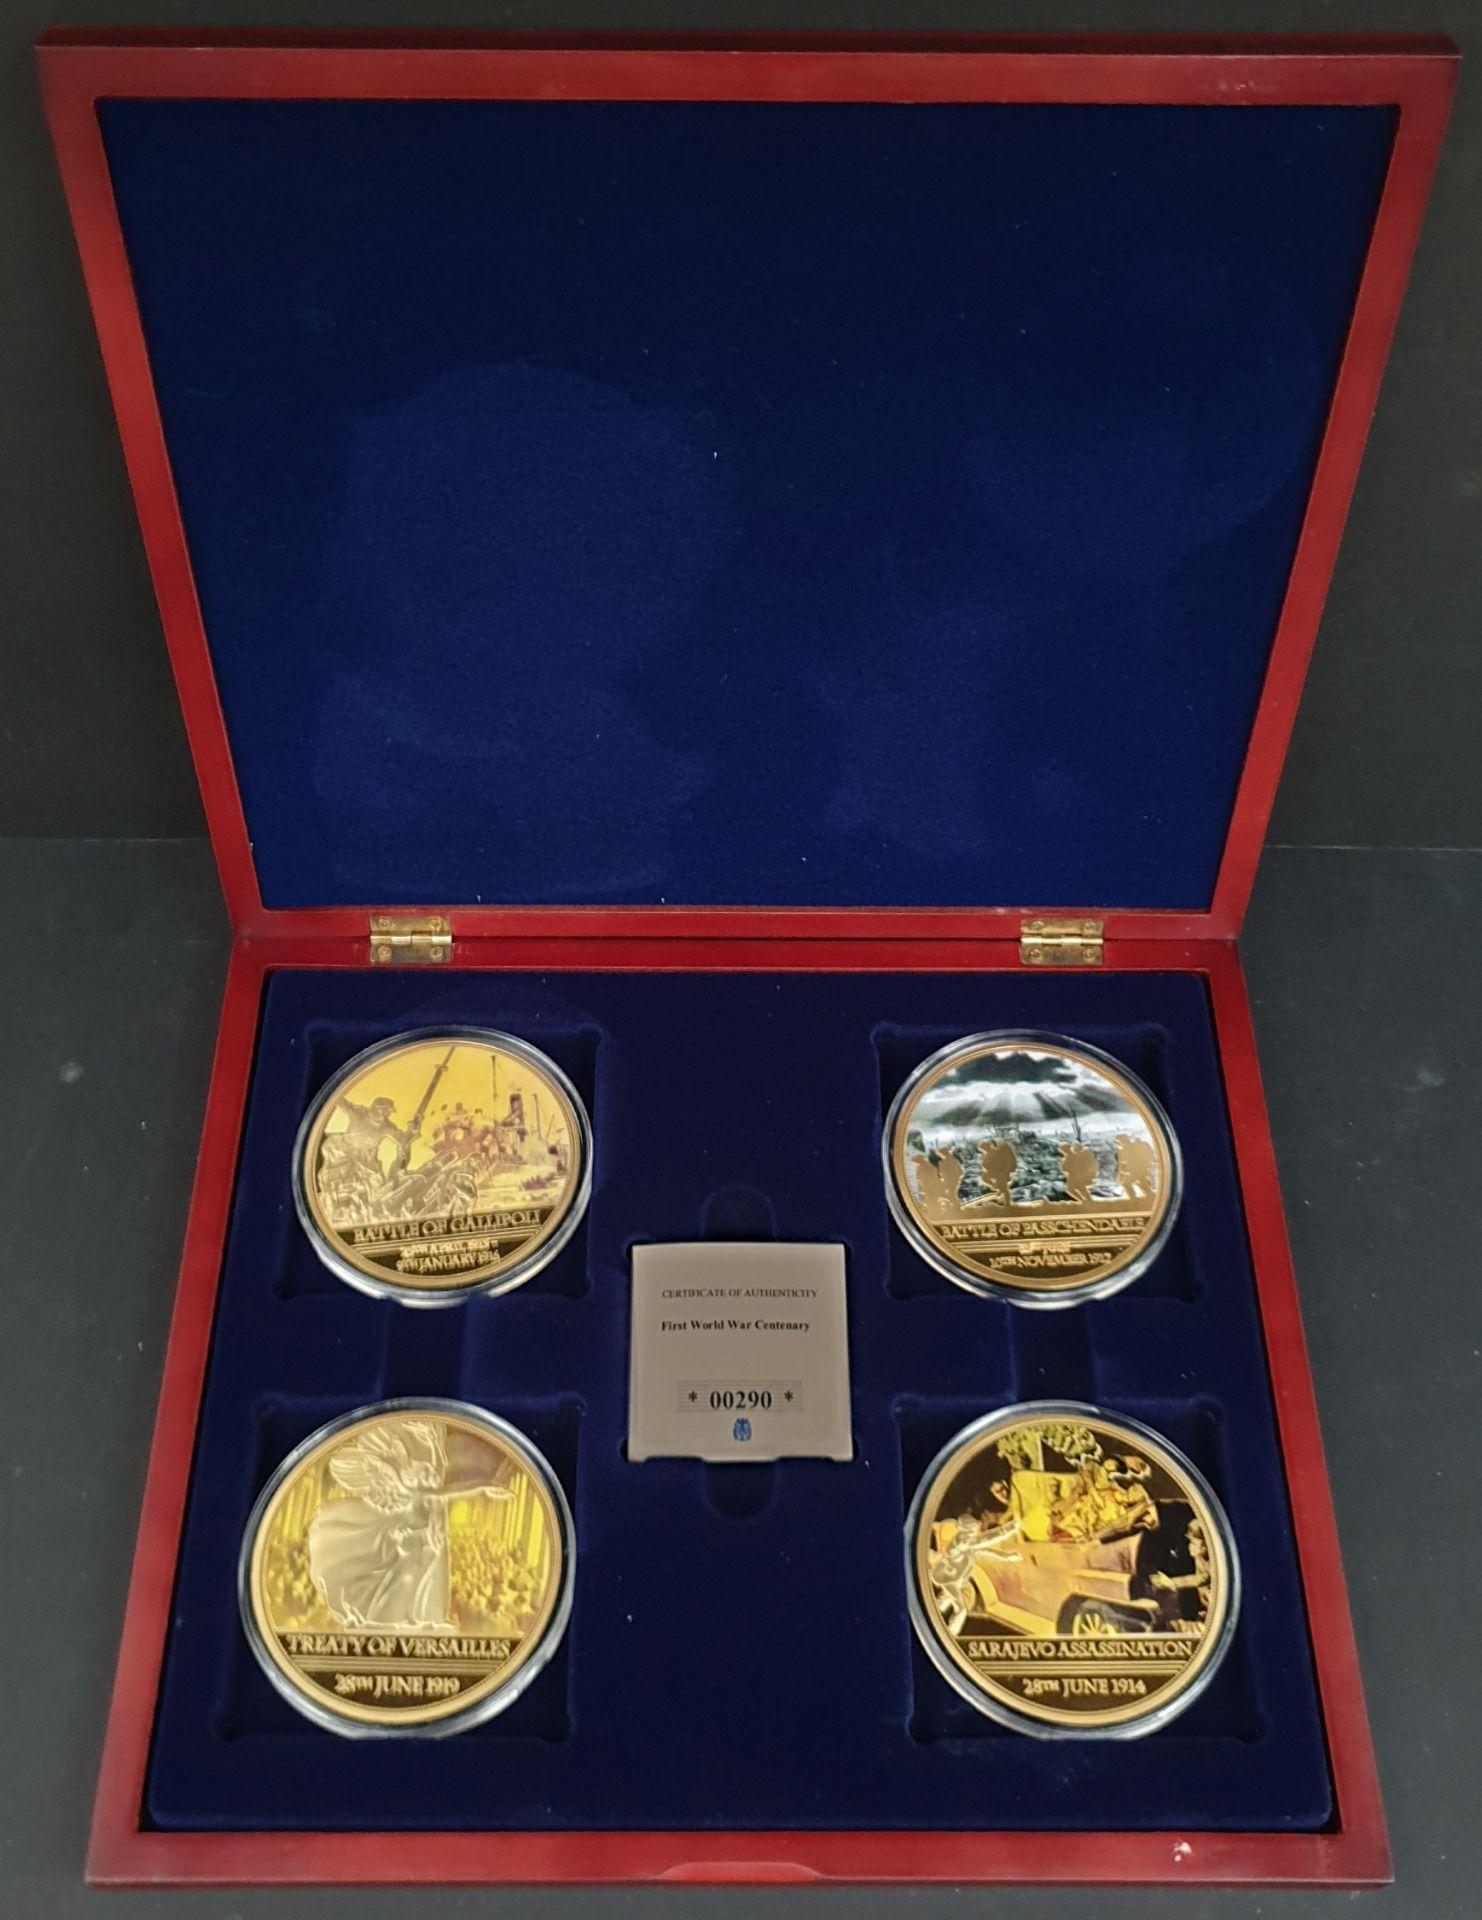 Lot 10 - Collectable Coins Set 4 First World War Centenary